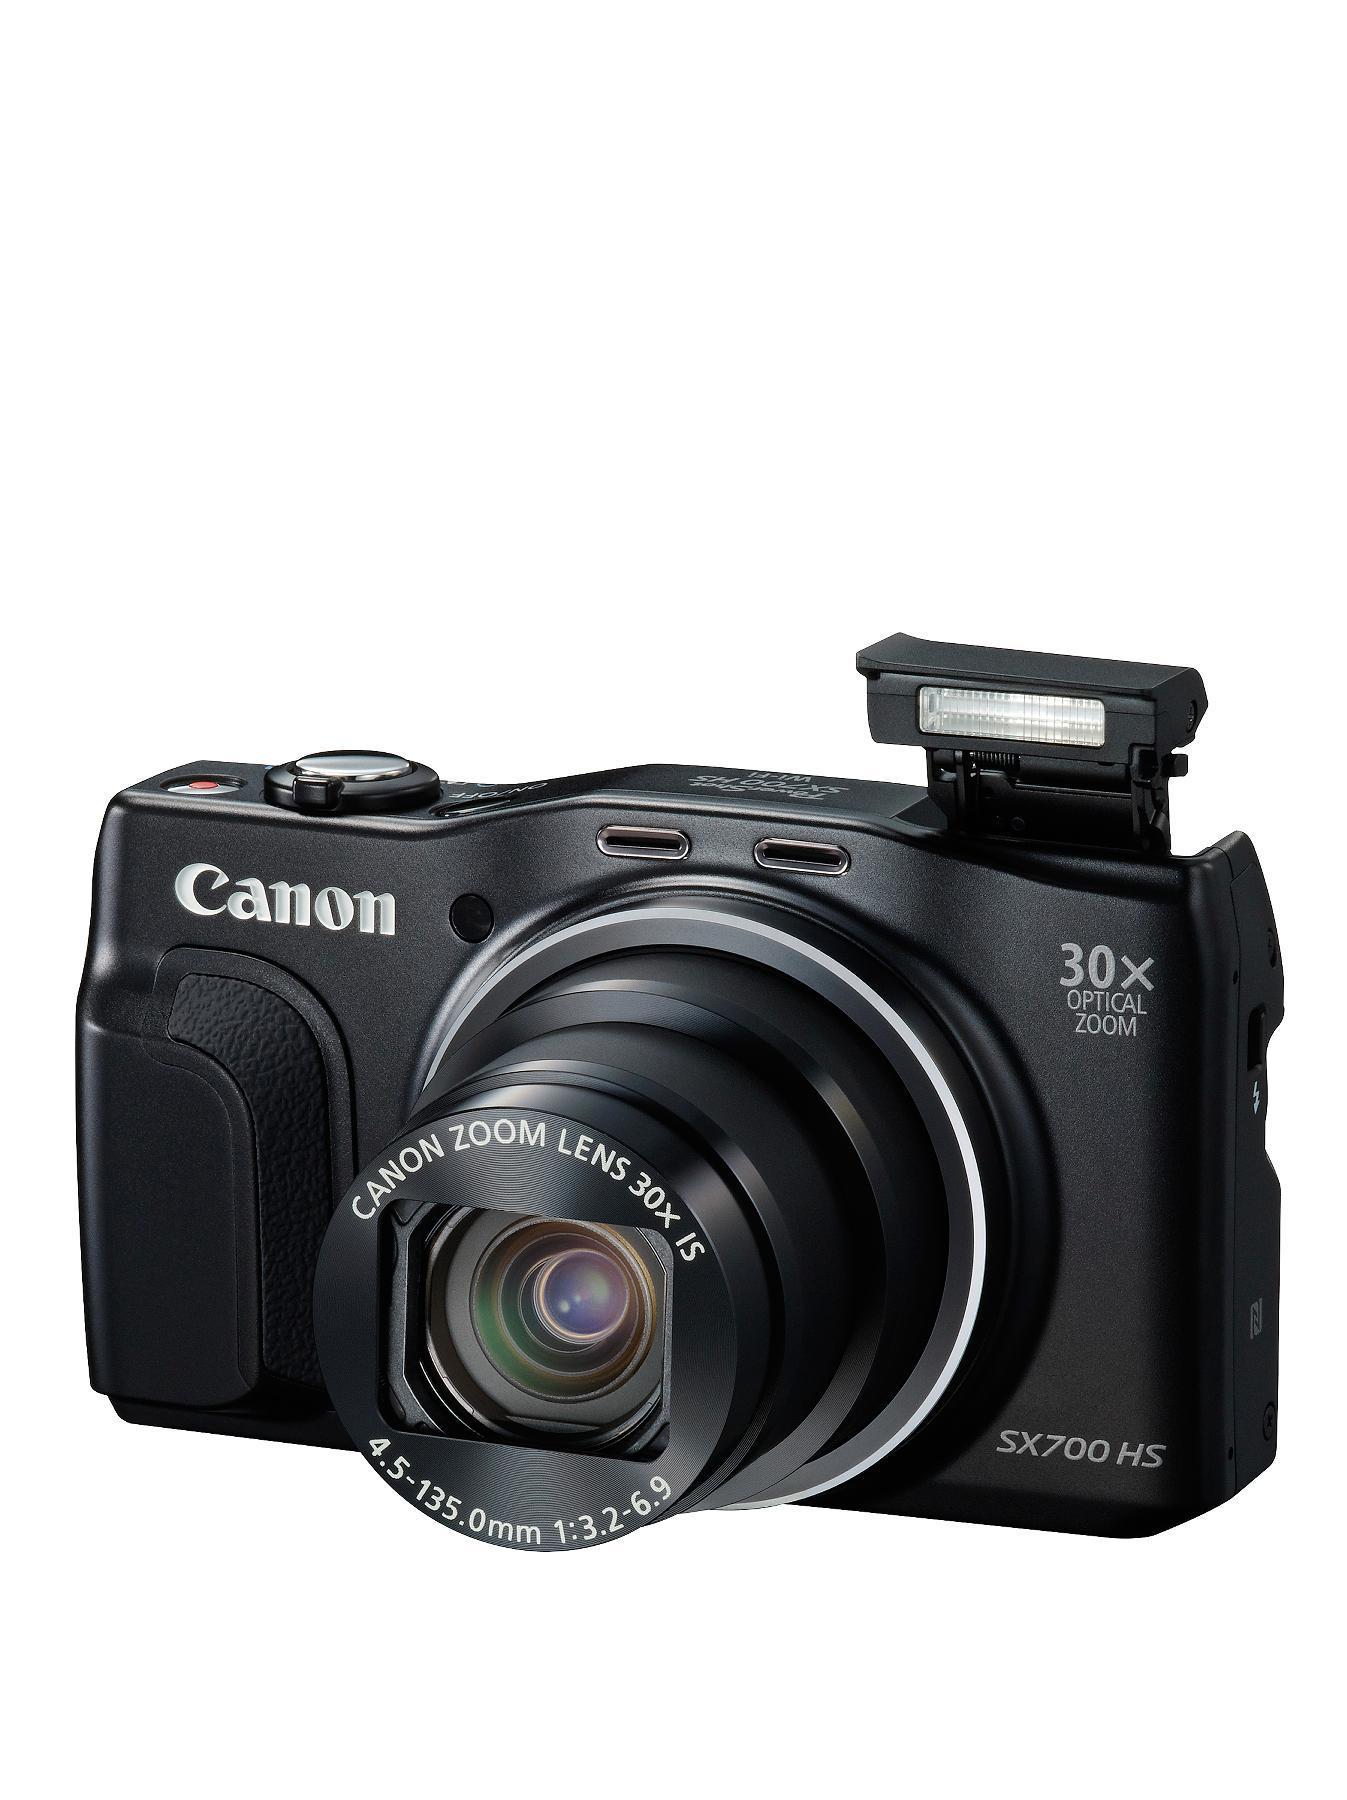 Canon PowerShot SX700 HS Compact Zoom